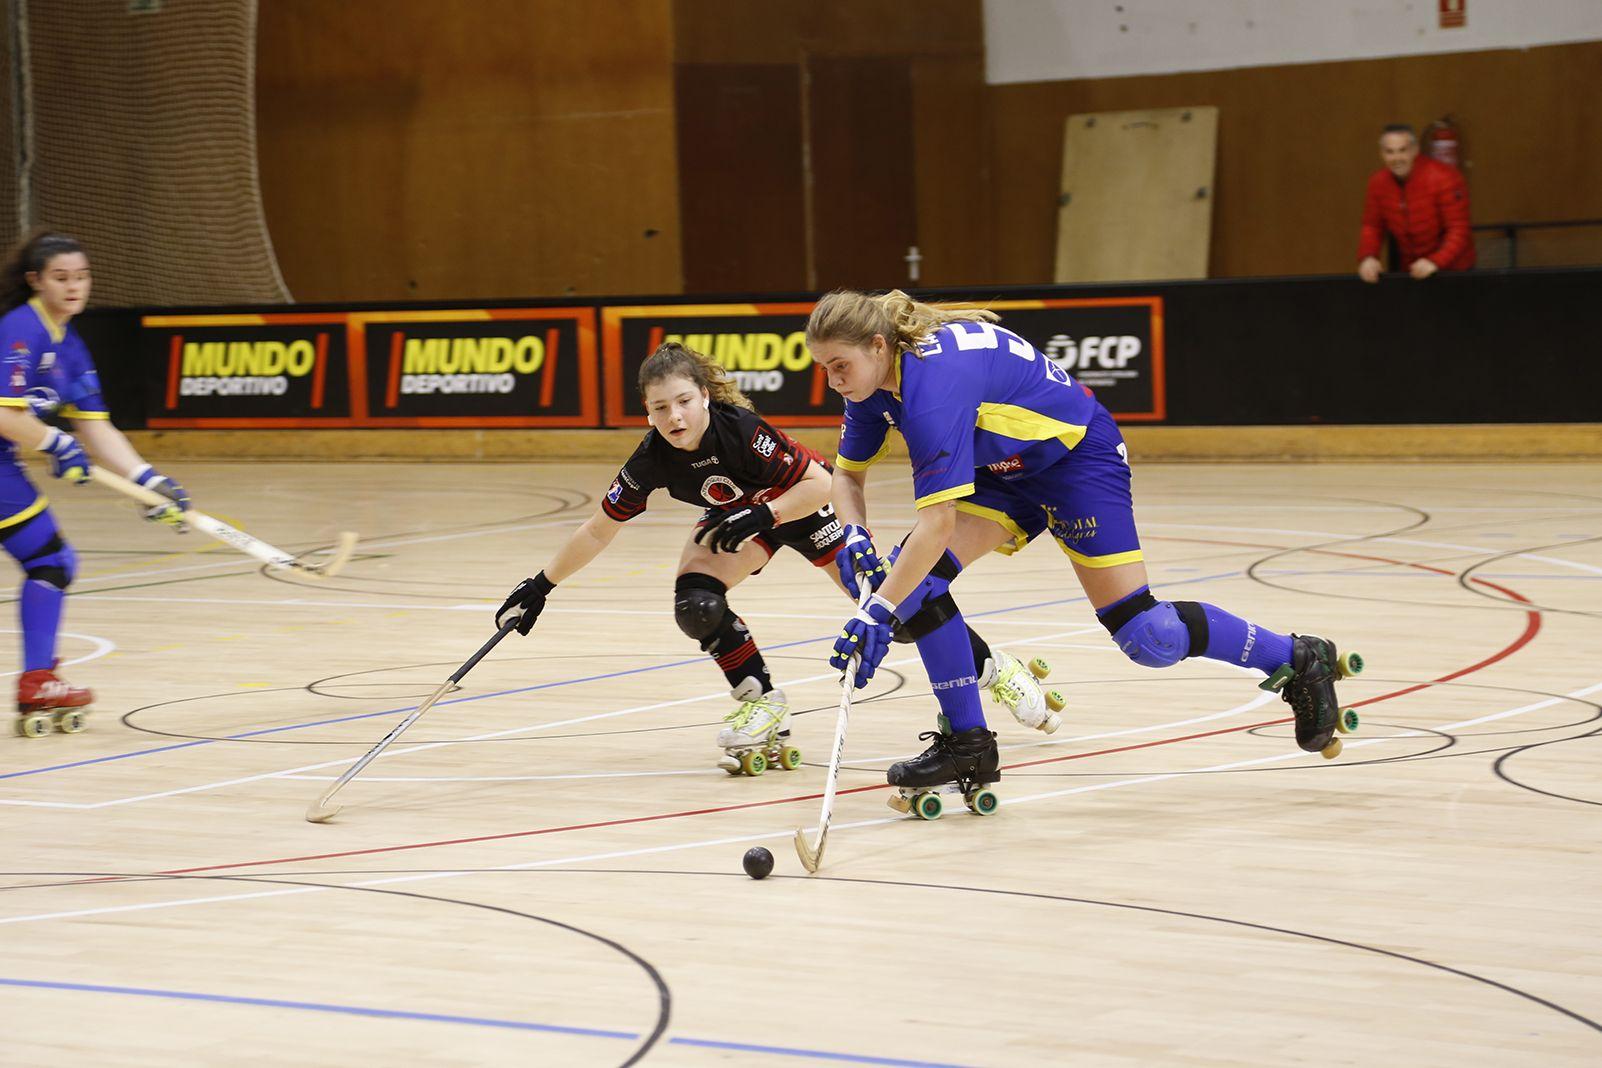 Hoquei sobre patins femení Partit de Lliga PHC Sant Cugat- Areces Asturhoquey. FOTO: Anna Bassa